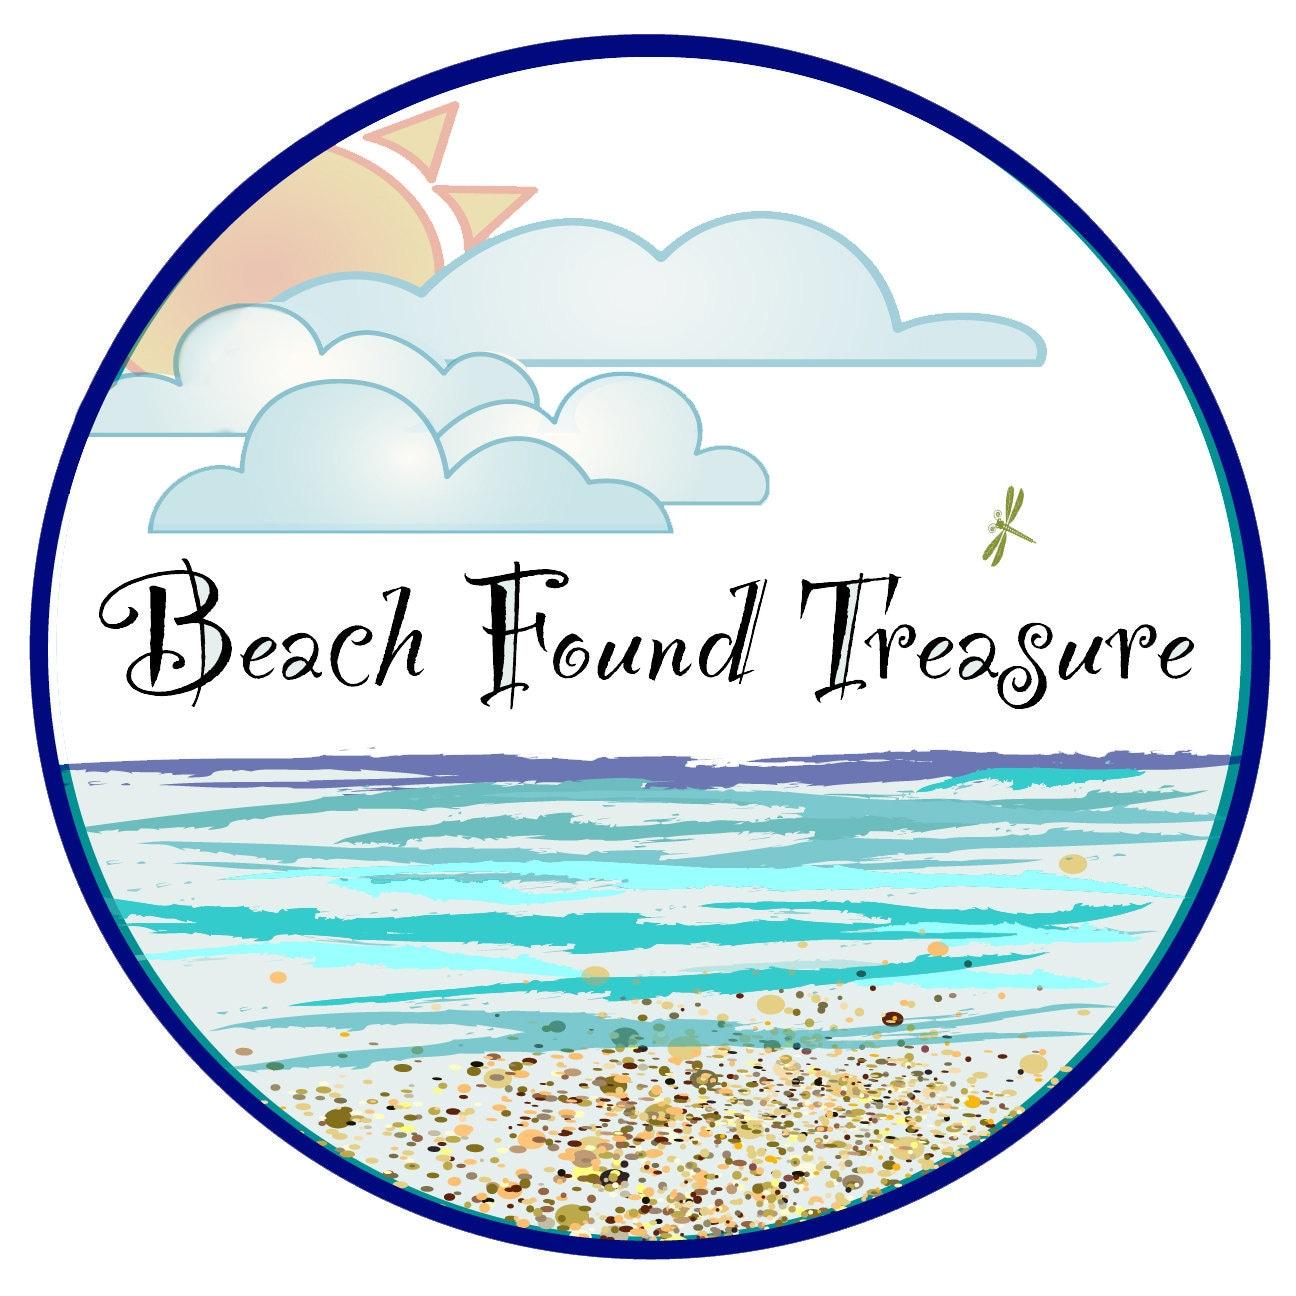 BeachFoundTreasure - Lake Michigan Beach Glass...treasures from the Lake!